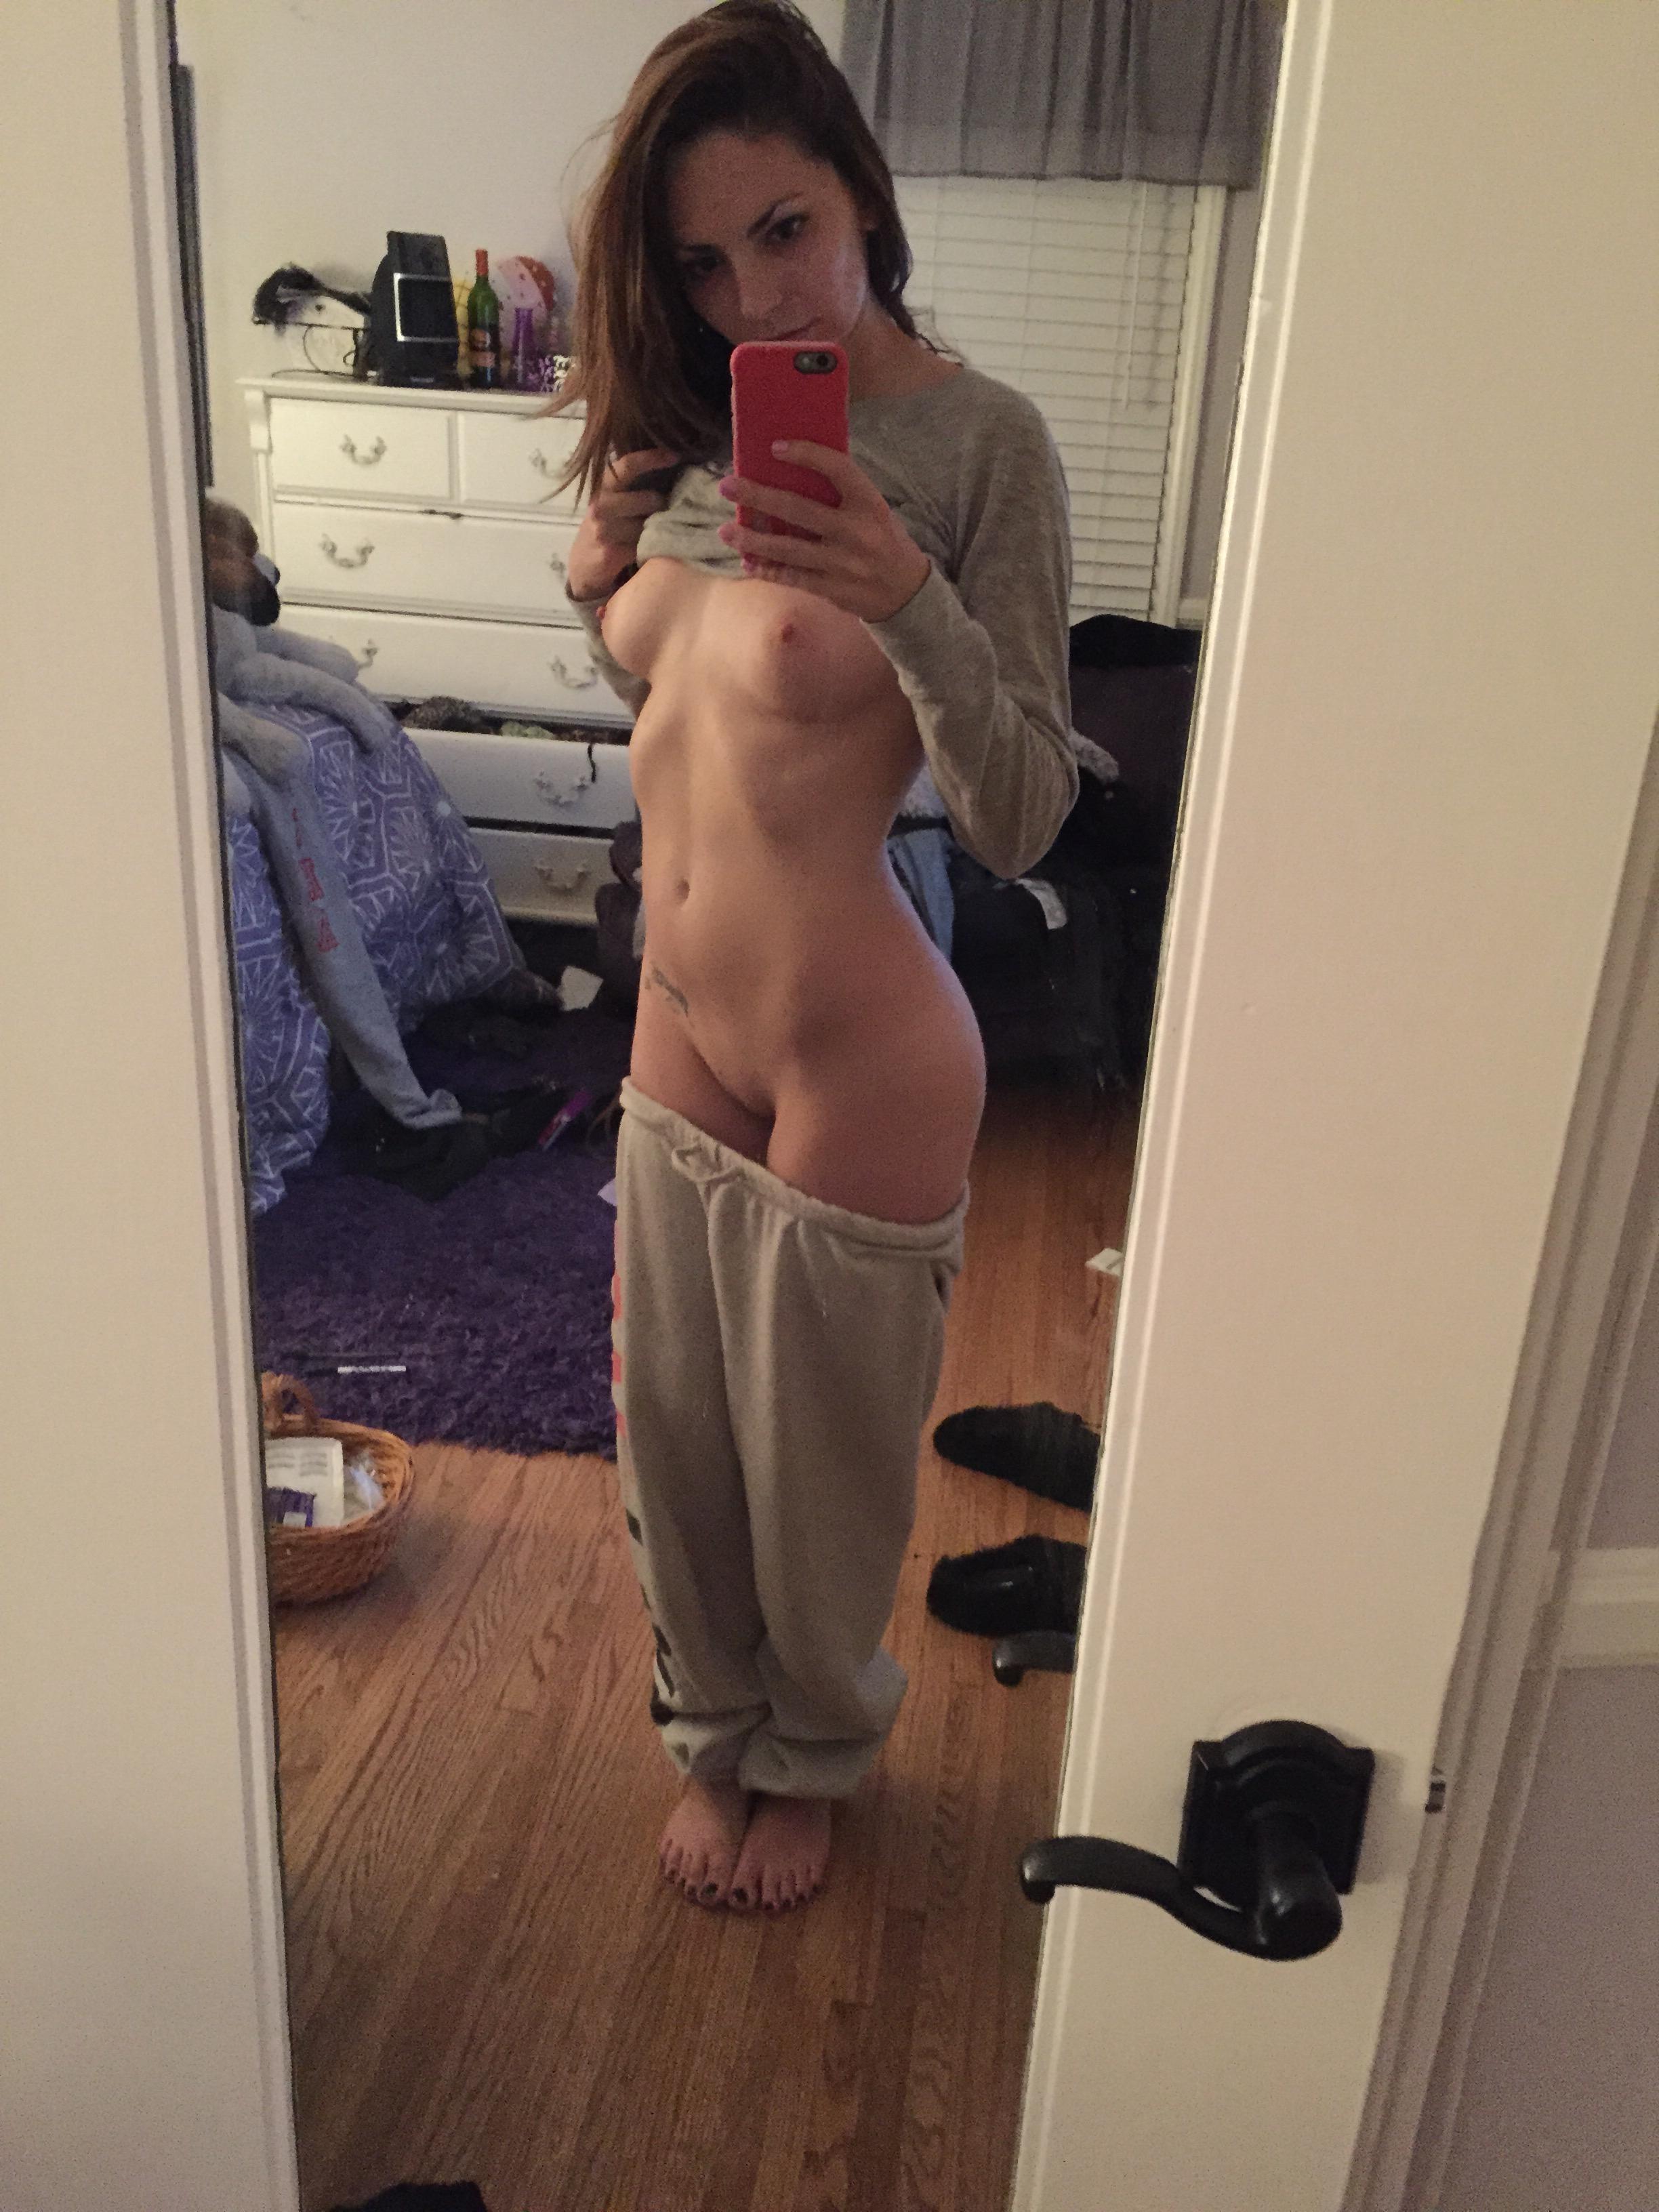 selfie-naked-girls-selfshot-amateur-mix-vol5-18